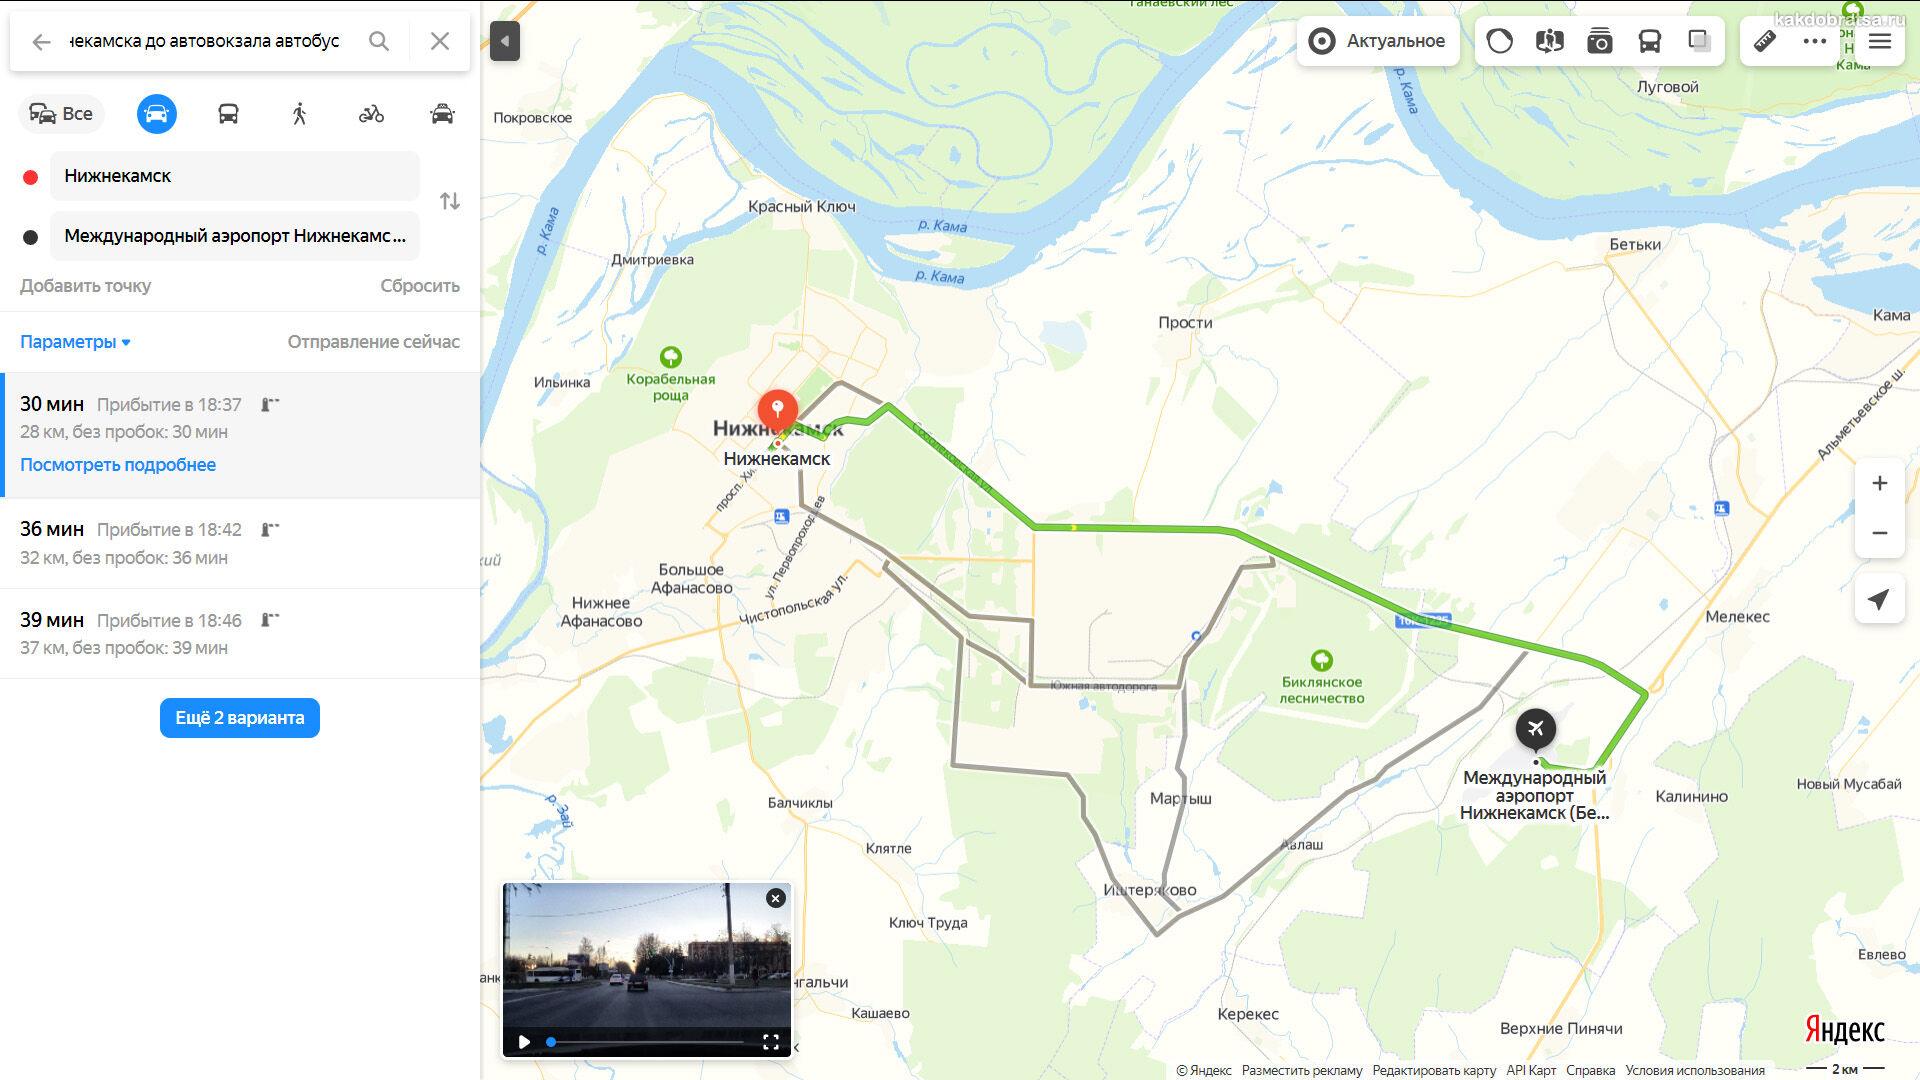 Аэропорт в Нижнекамске на карте и адрес